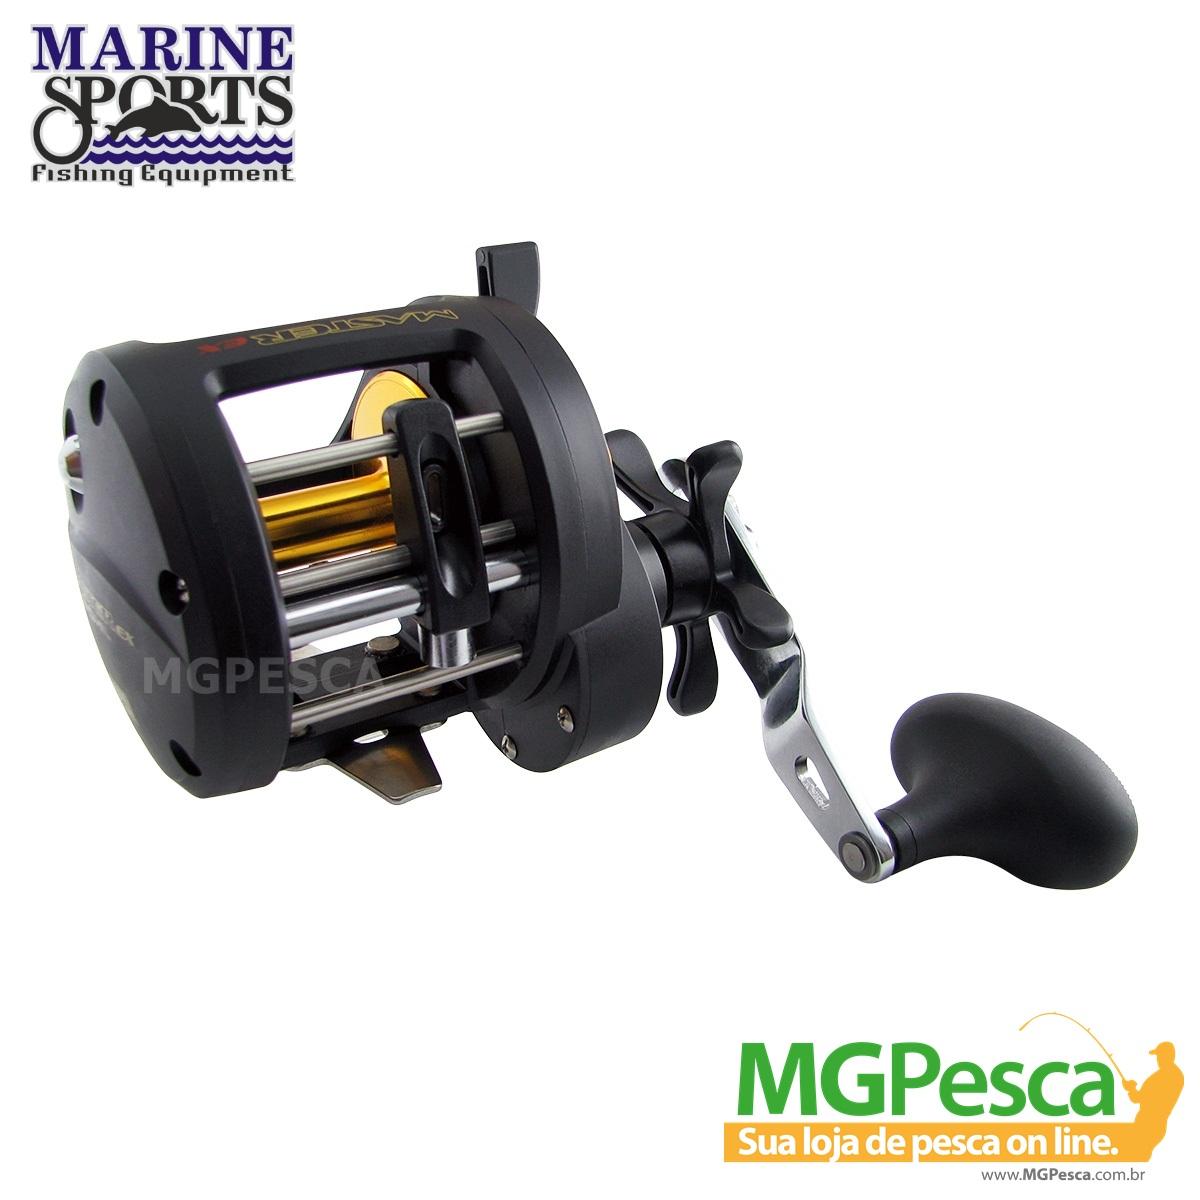 Carretilha Marine Sports Master EX 30  - MGPesca